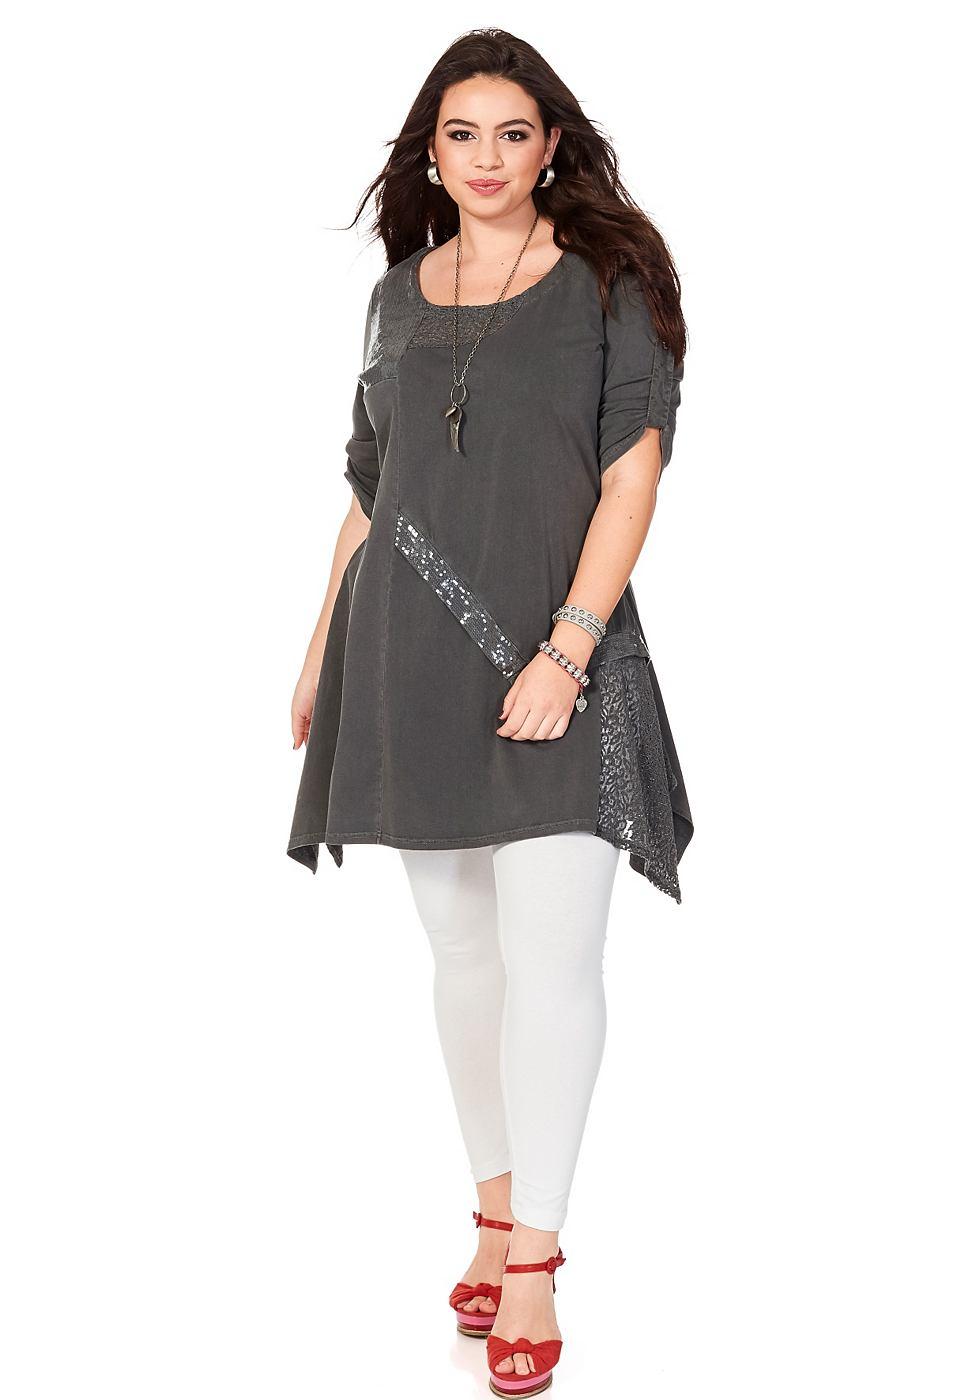 SHEEGO TREND jurk in washed-look grijs